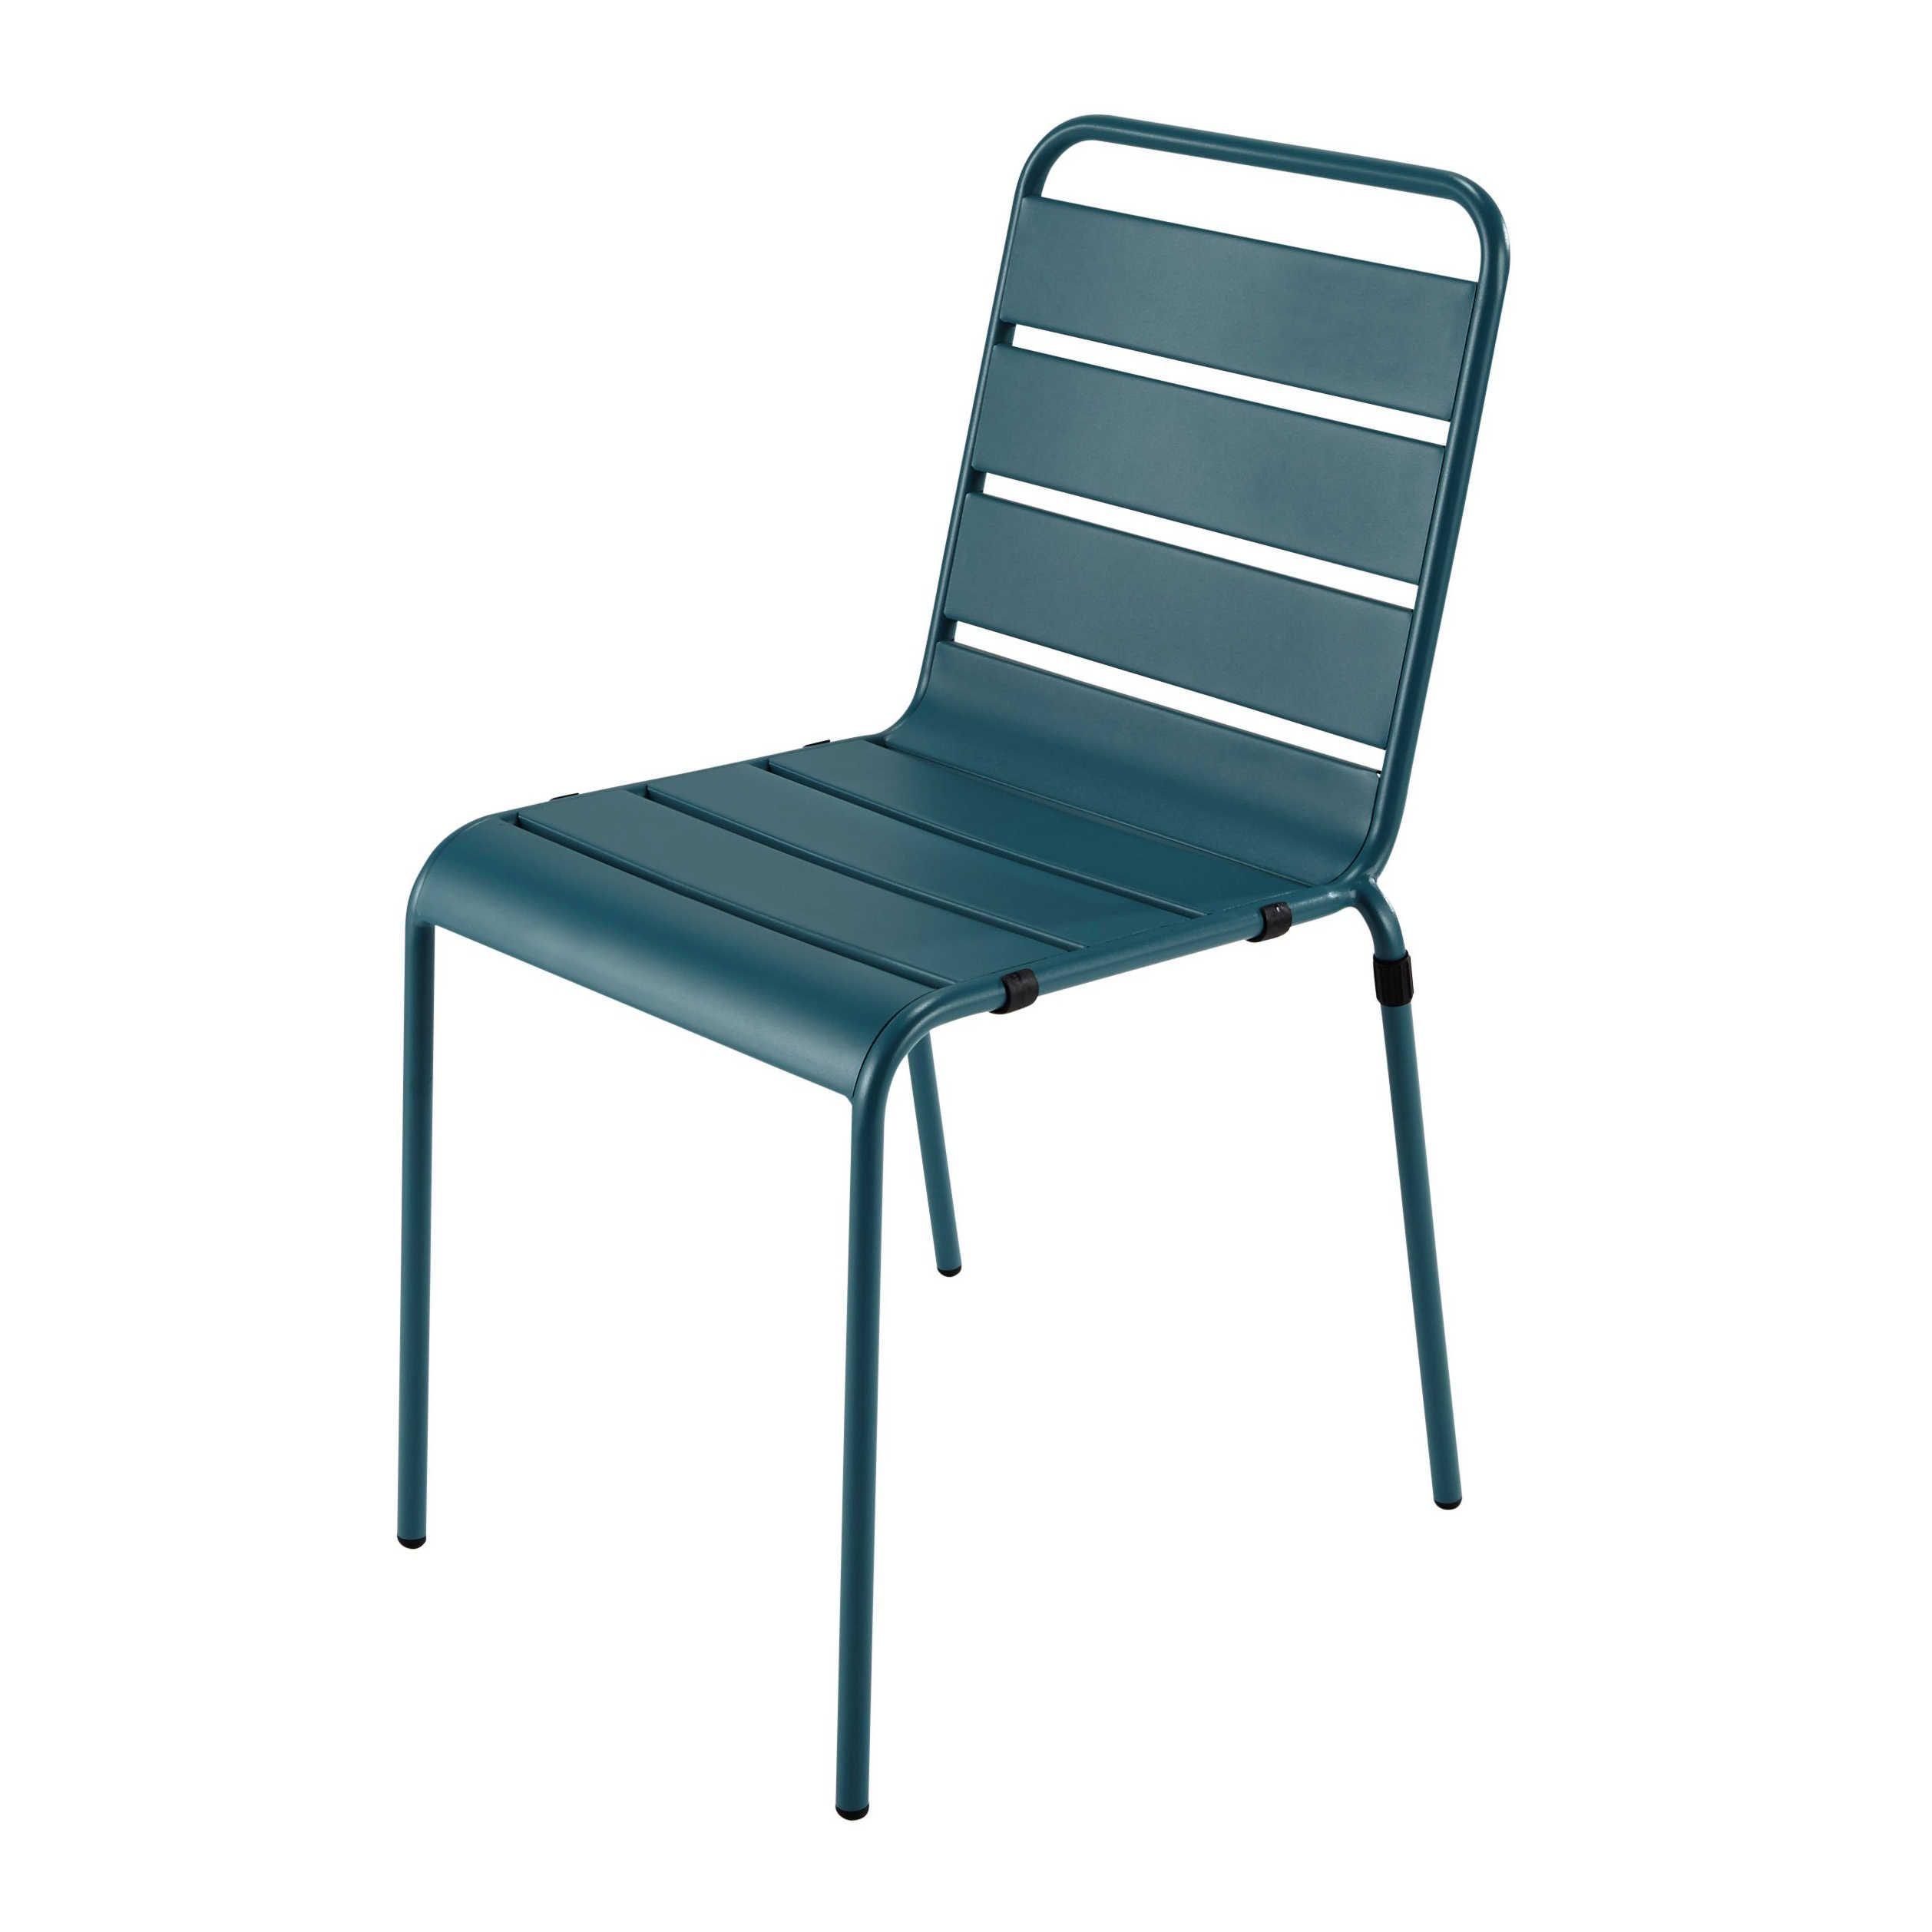 Chaise de jardin en métal bleu canard Batignolles